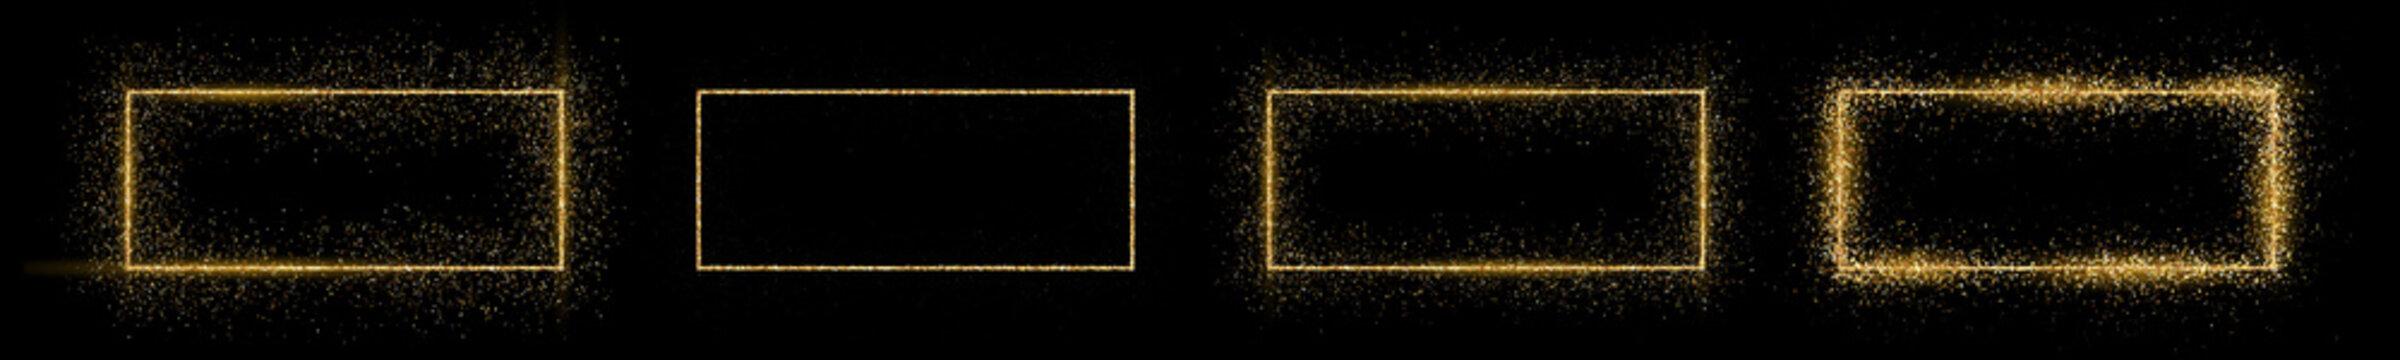 Golden rectangle frame with glitter